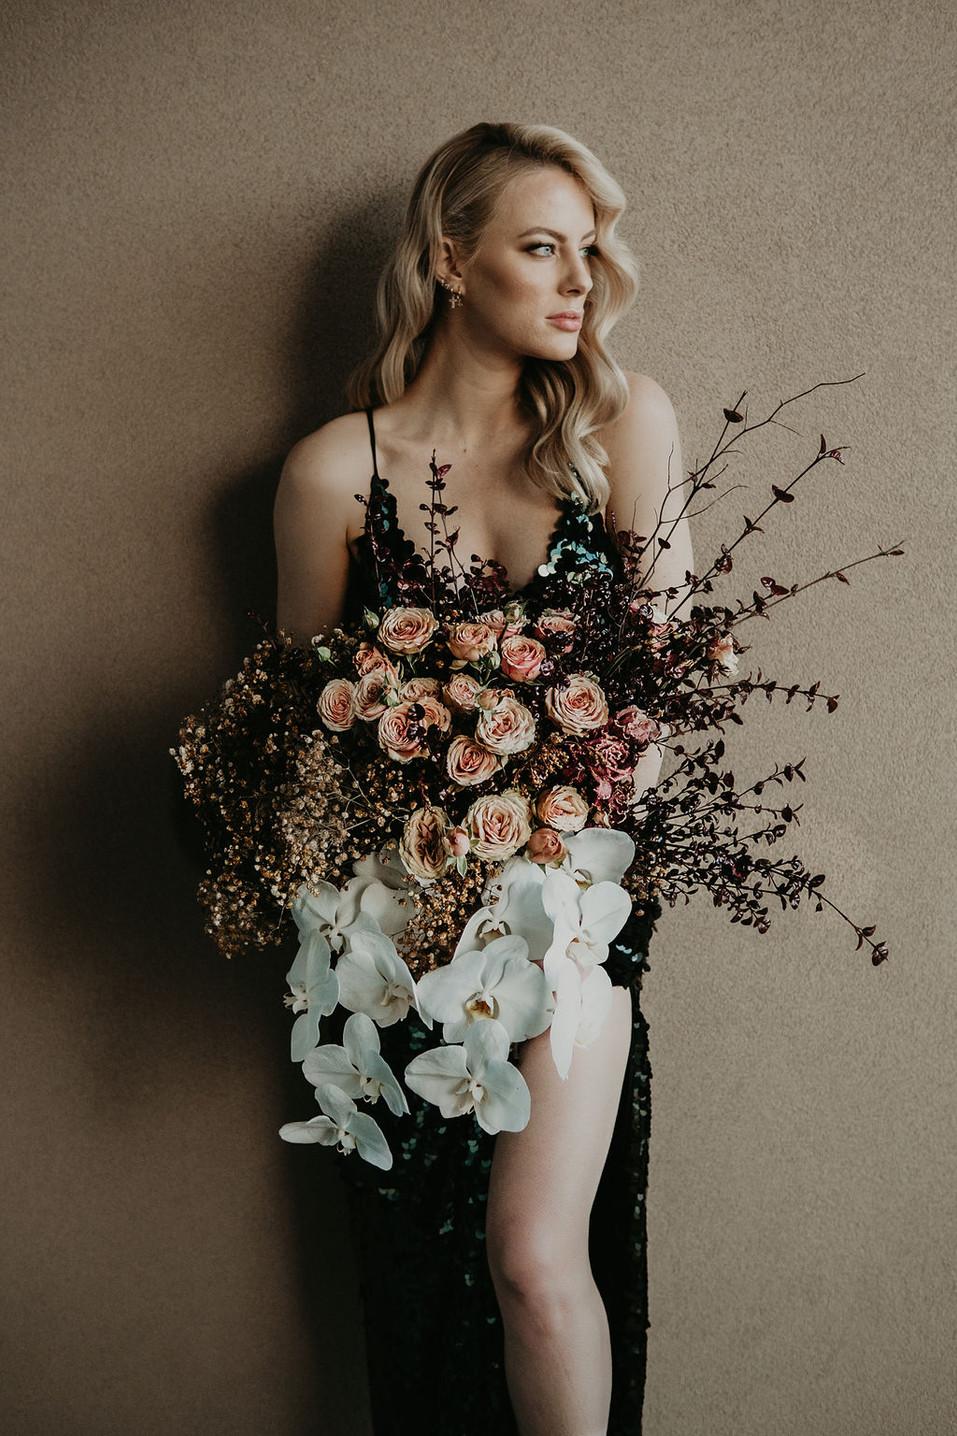 freo-urban-wedding-shoot-50.jpg